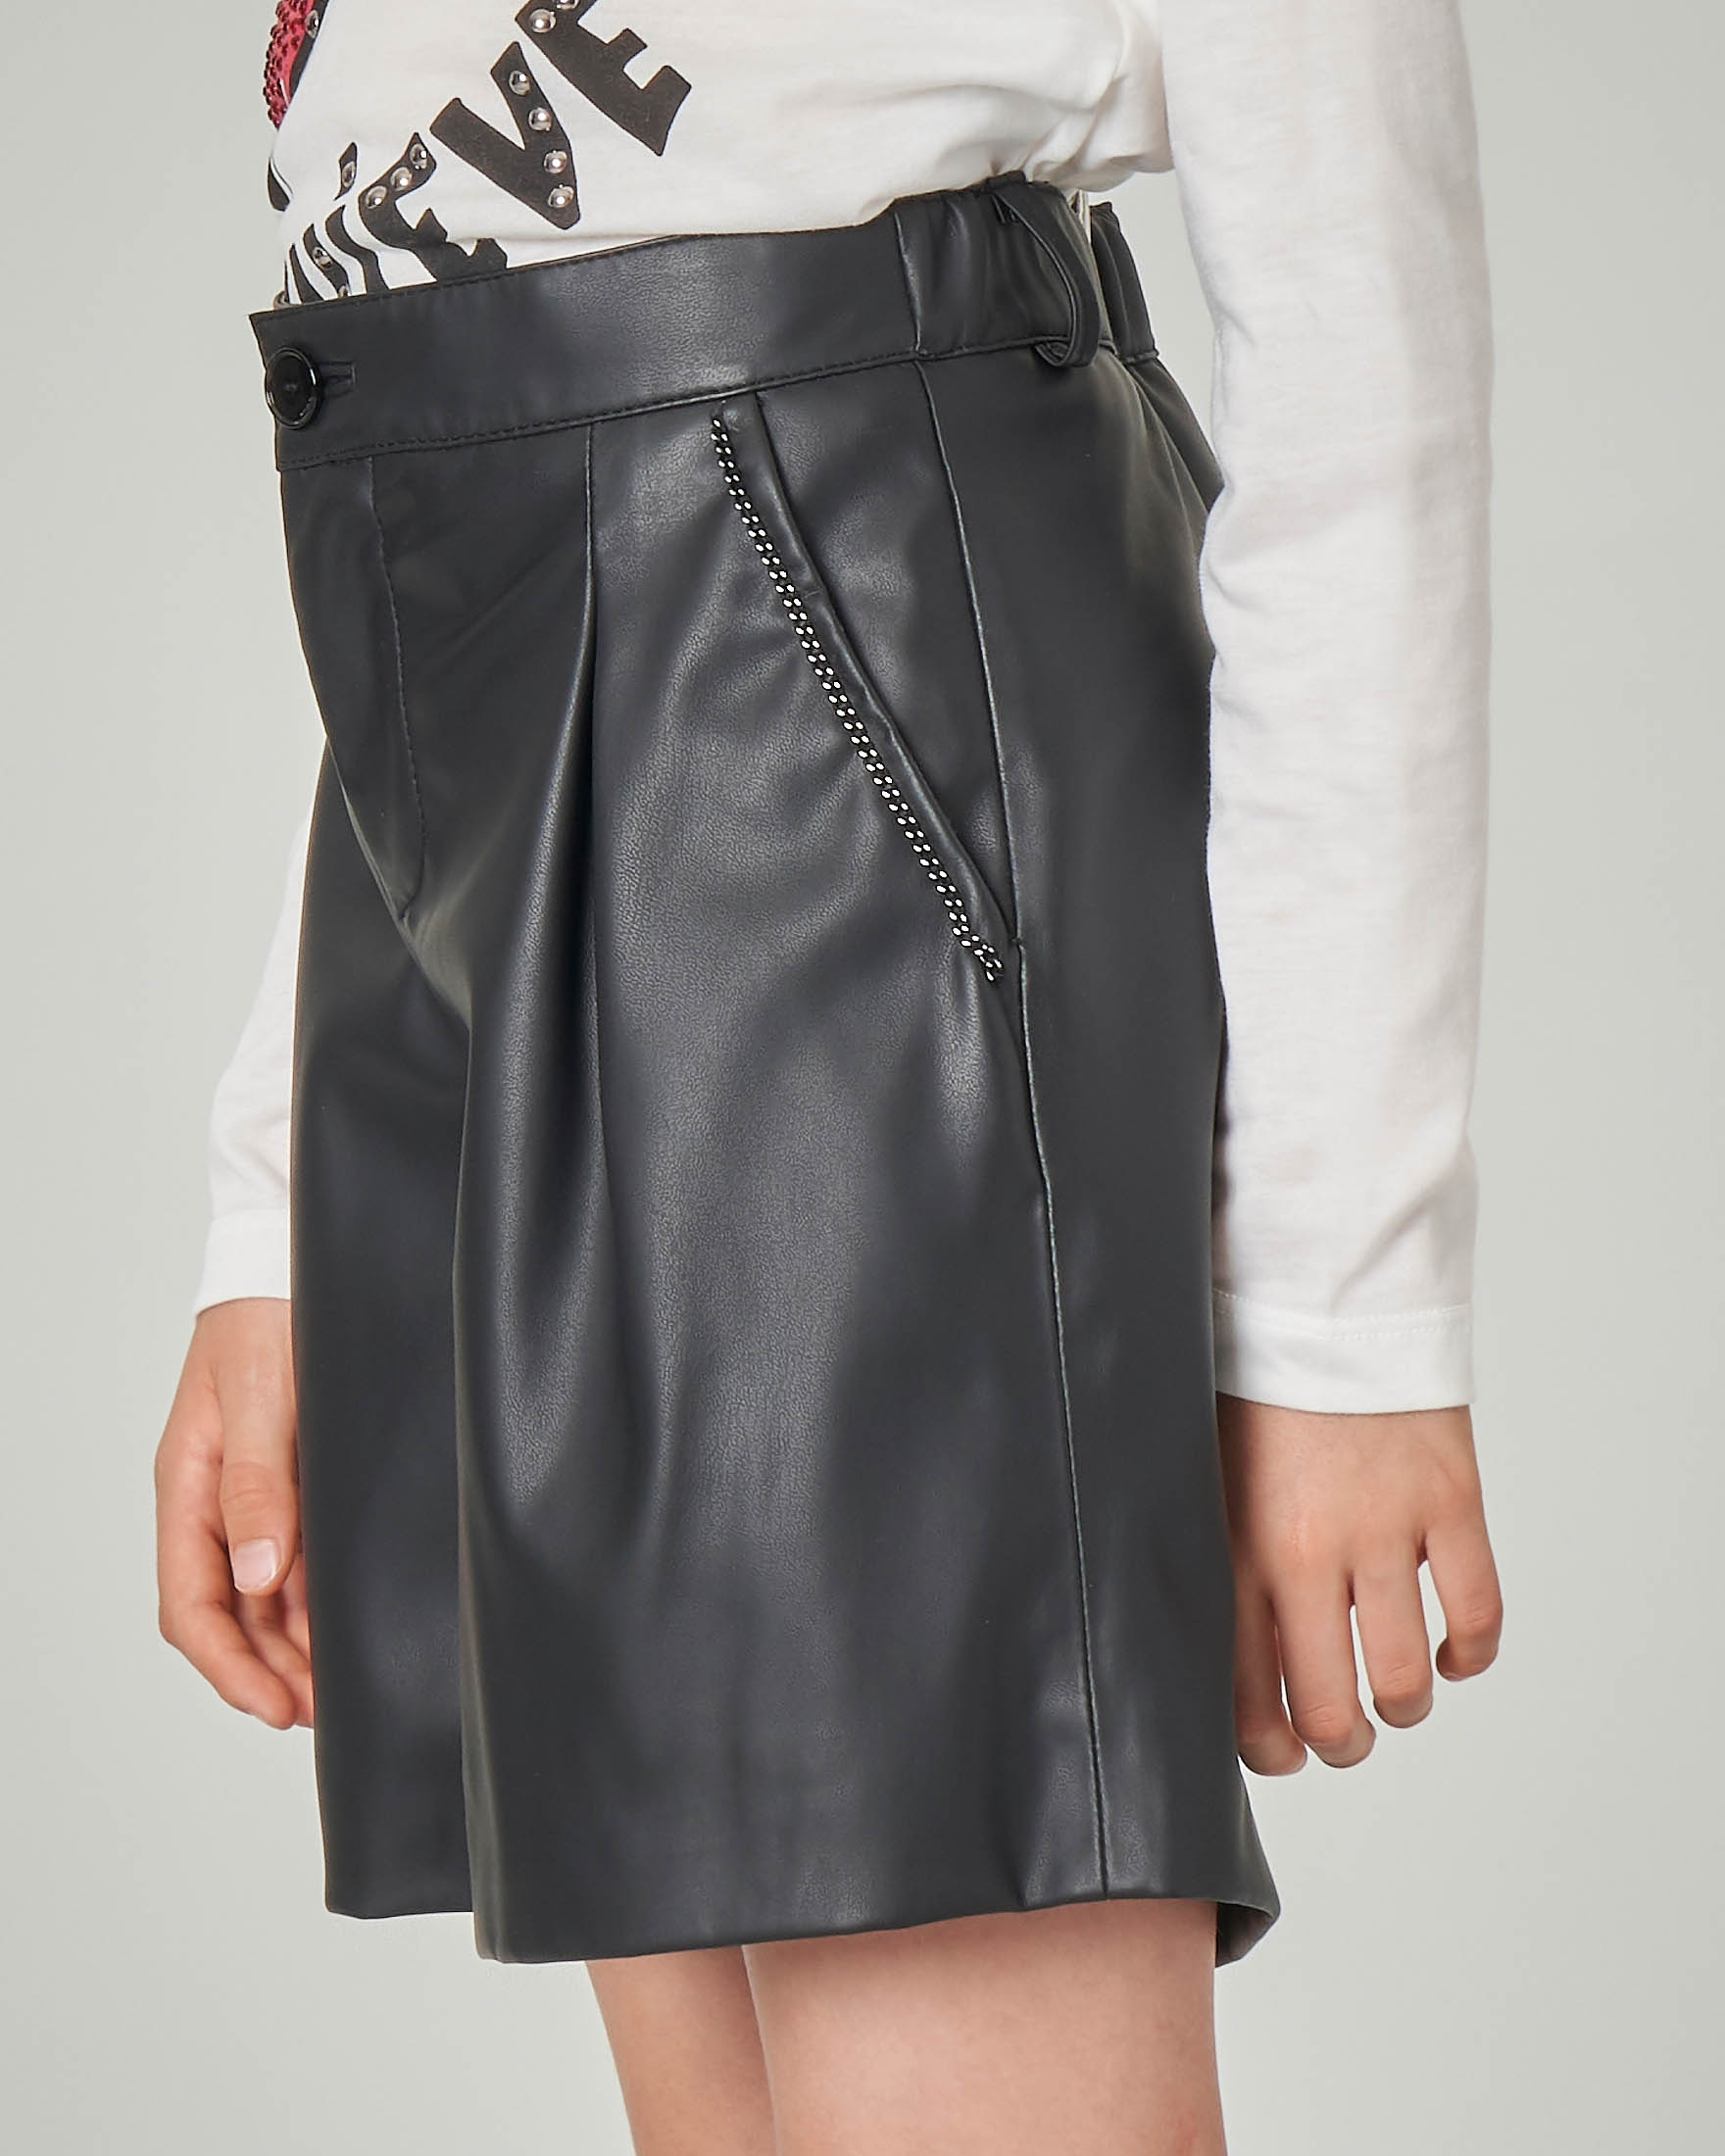 newest cf525 a0055 Gonna nera a pantalone in ecopelle S-XL | Pellizzari E-commerce